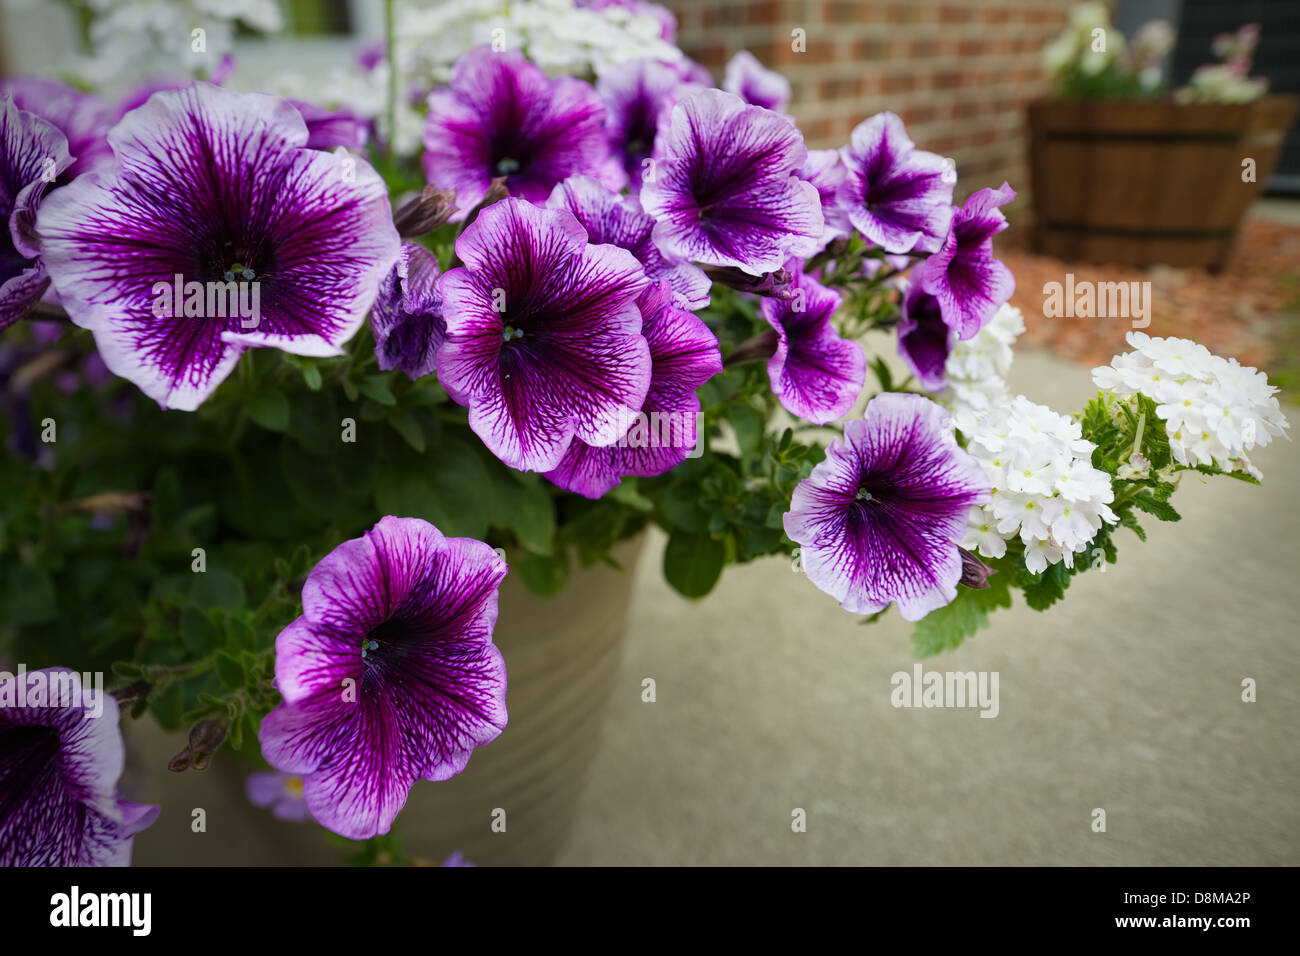 Trailing Petunias Stock Photos Trailing Petunias Stock Images Alamy